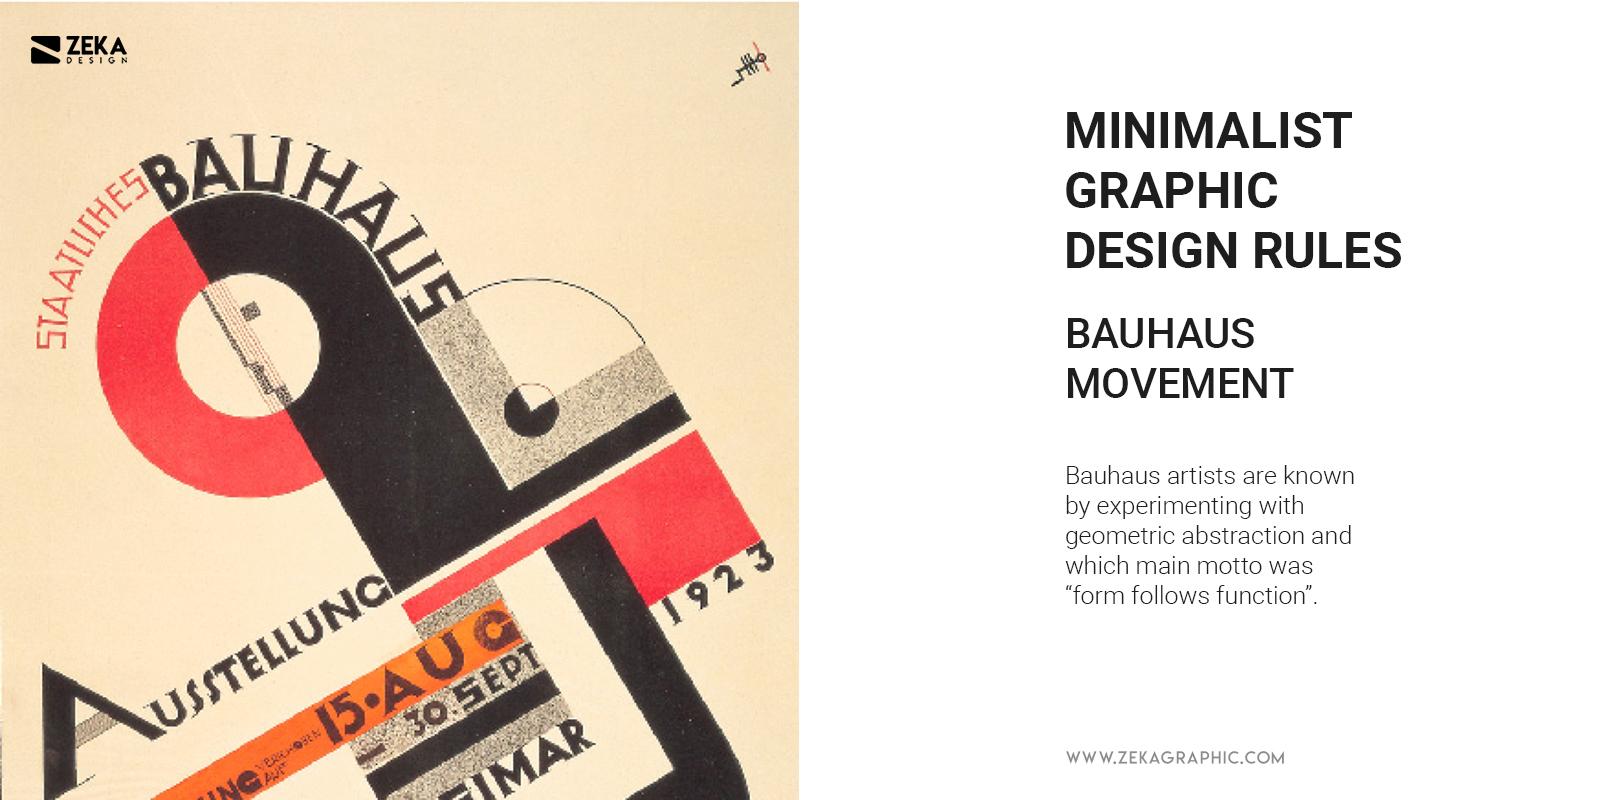 Bauhaus Minimalist Graphic Design Rules